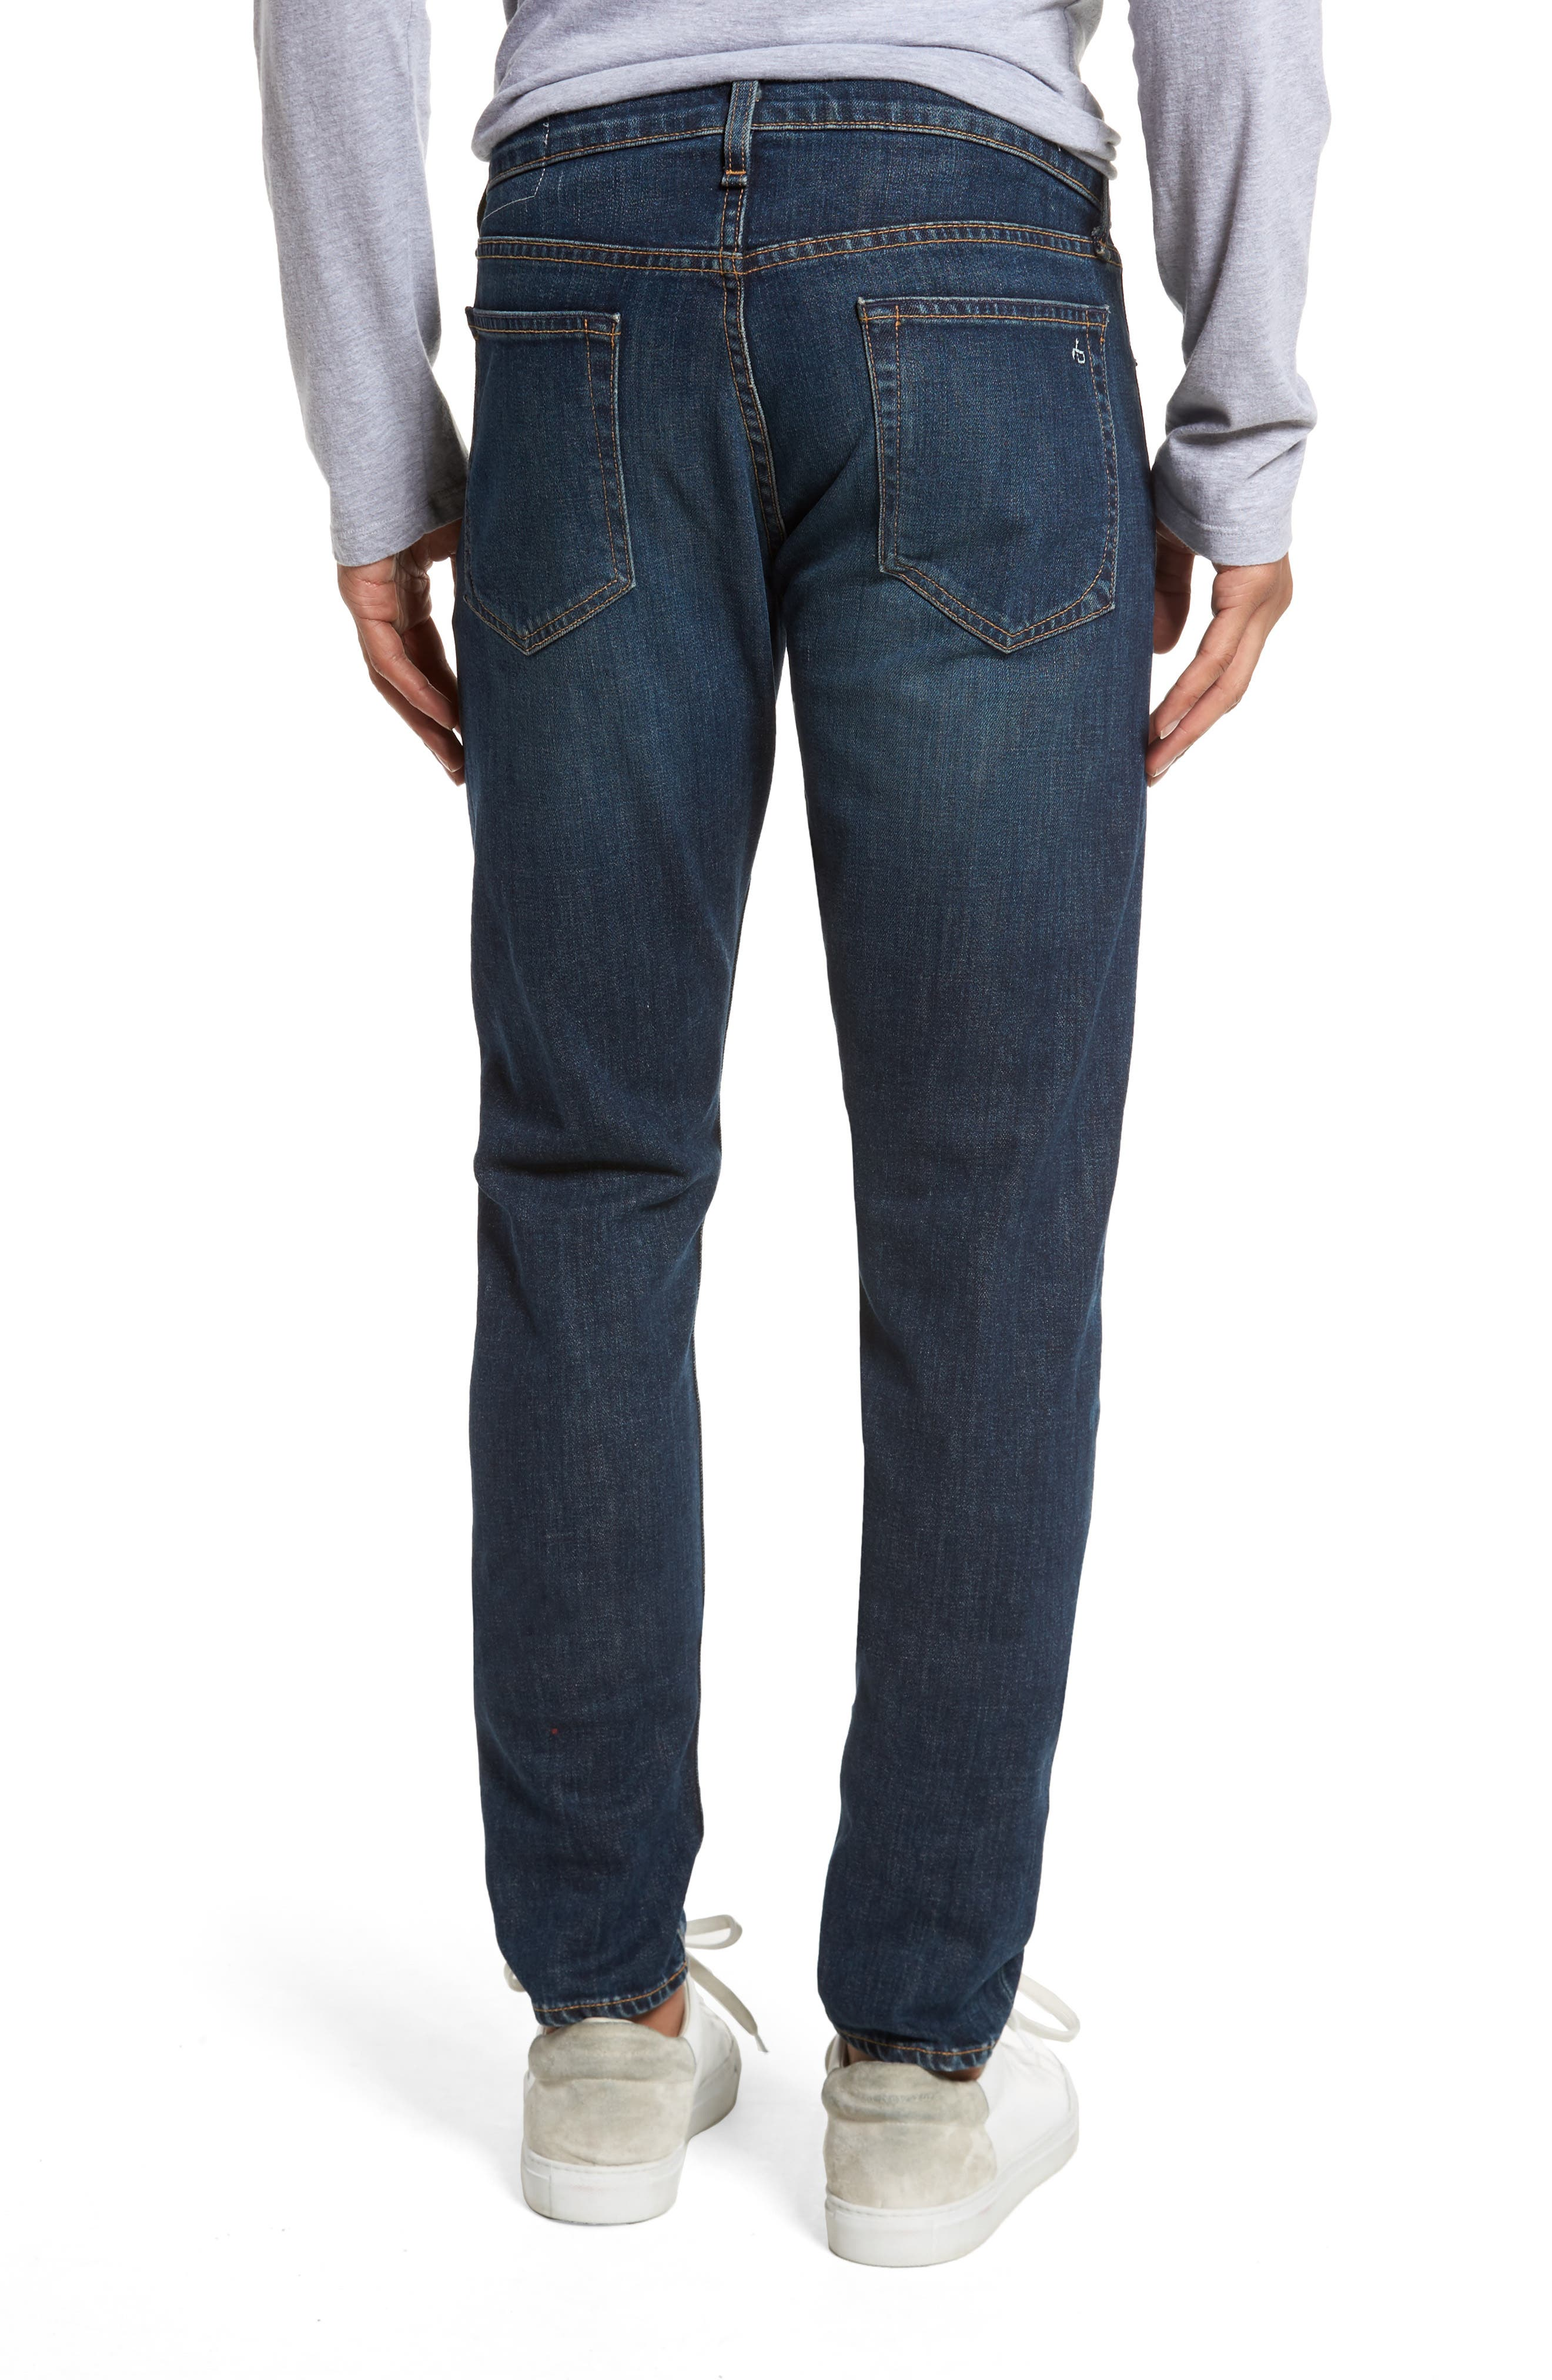 RAG & BONE,                             Fit 1 Skinny Fit Jeans,                             Alternate thumbnail 2, color,                             420